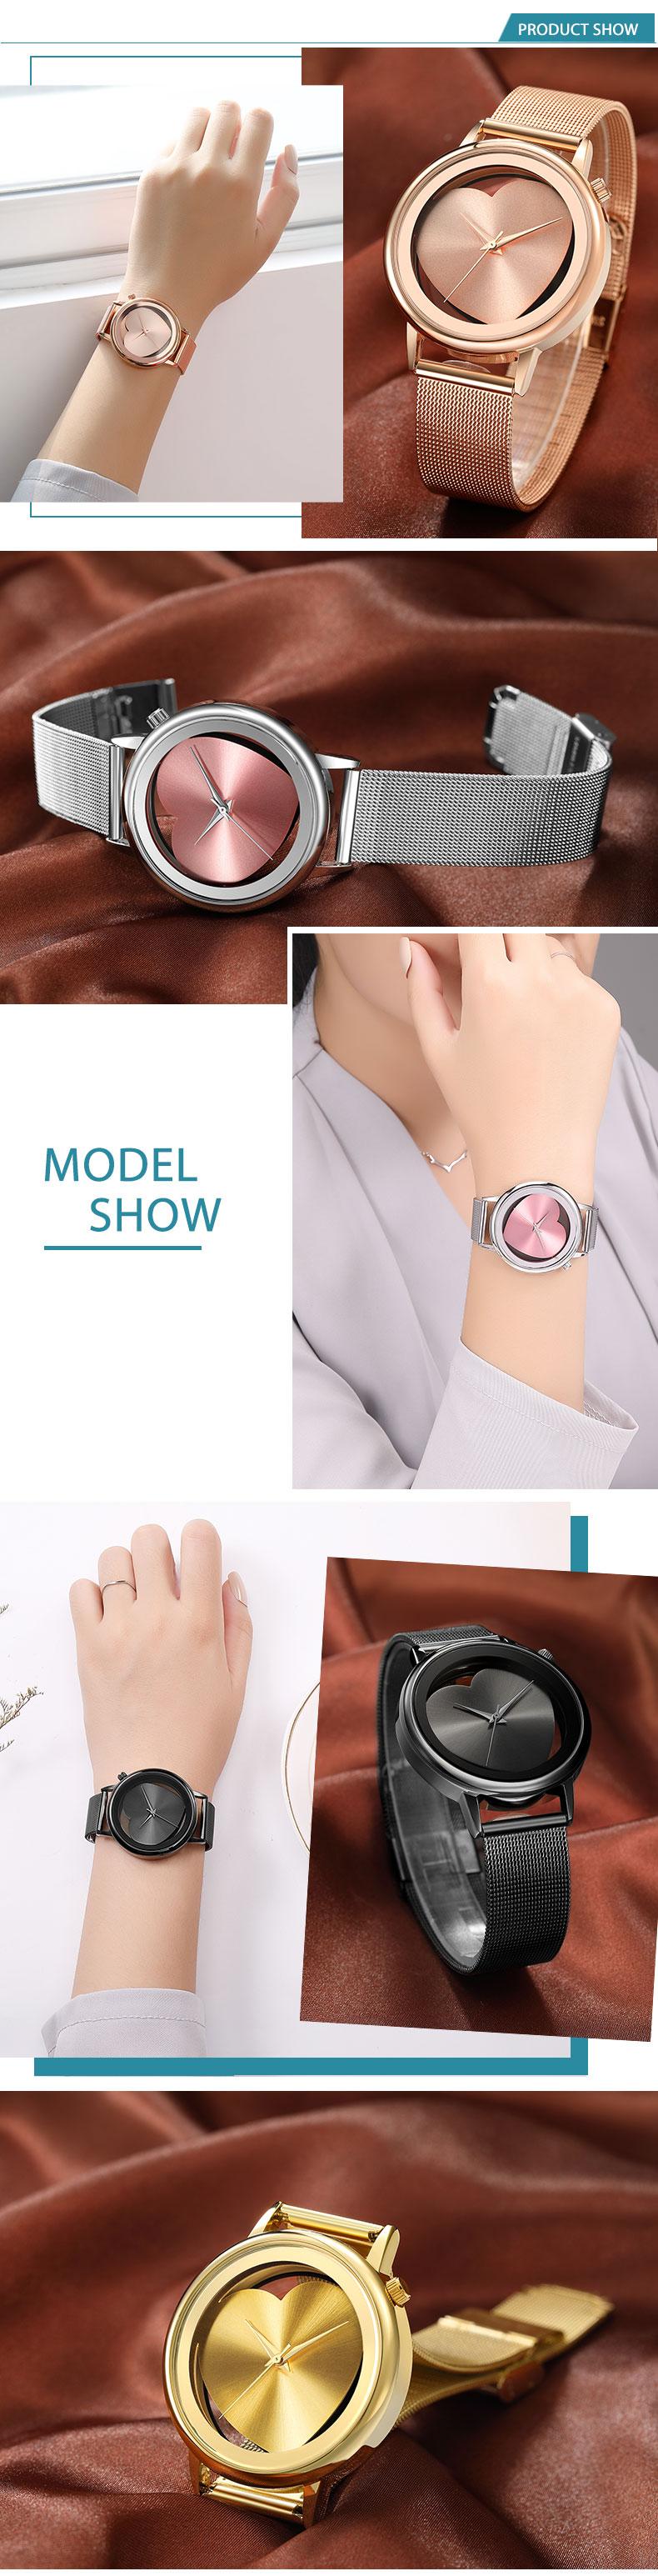 Women Watches Quartz Hollow Analog Stainless Steel Mesh Band Rose Gold Luxury Brand Design Wristwatch Fashion Dress New 10